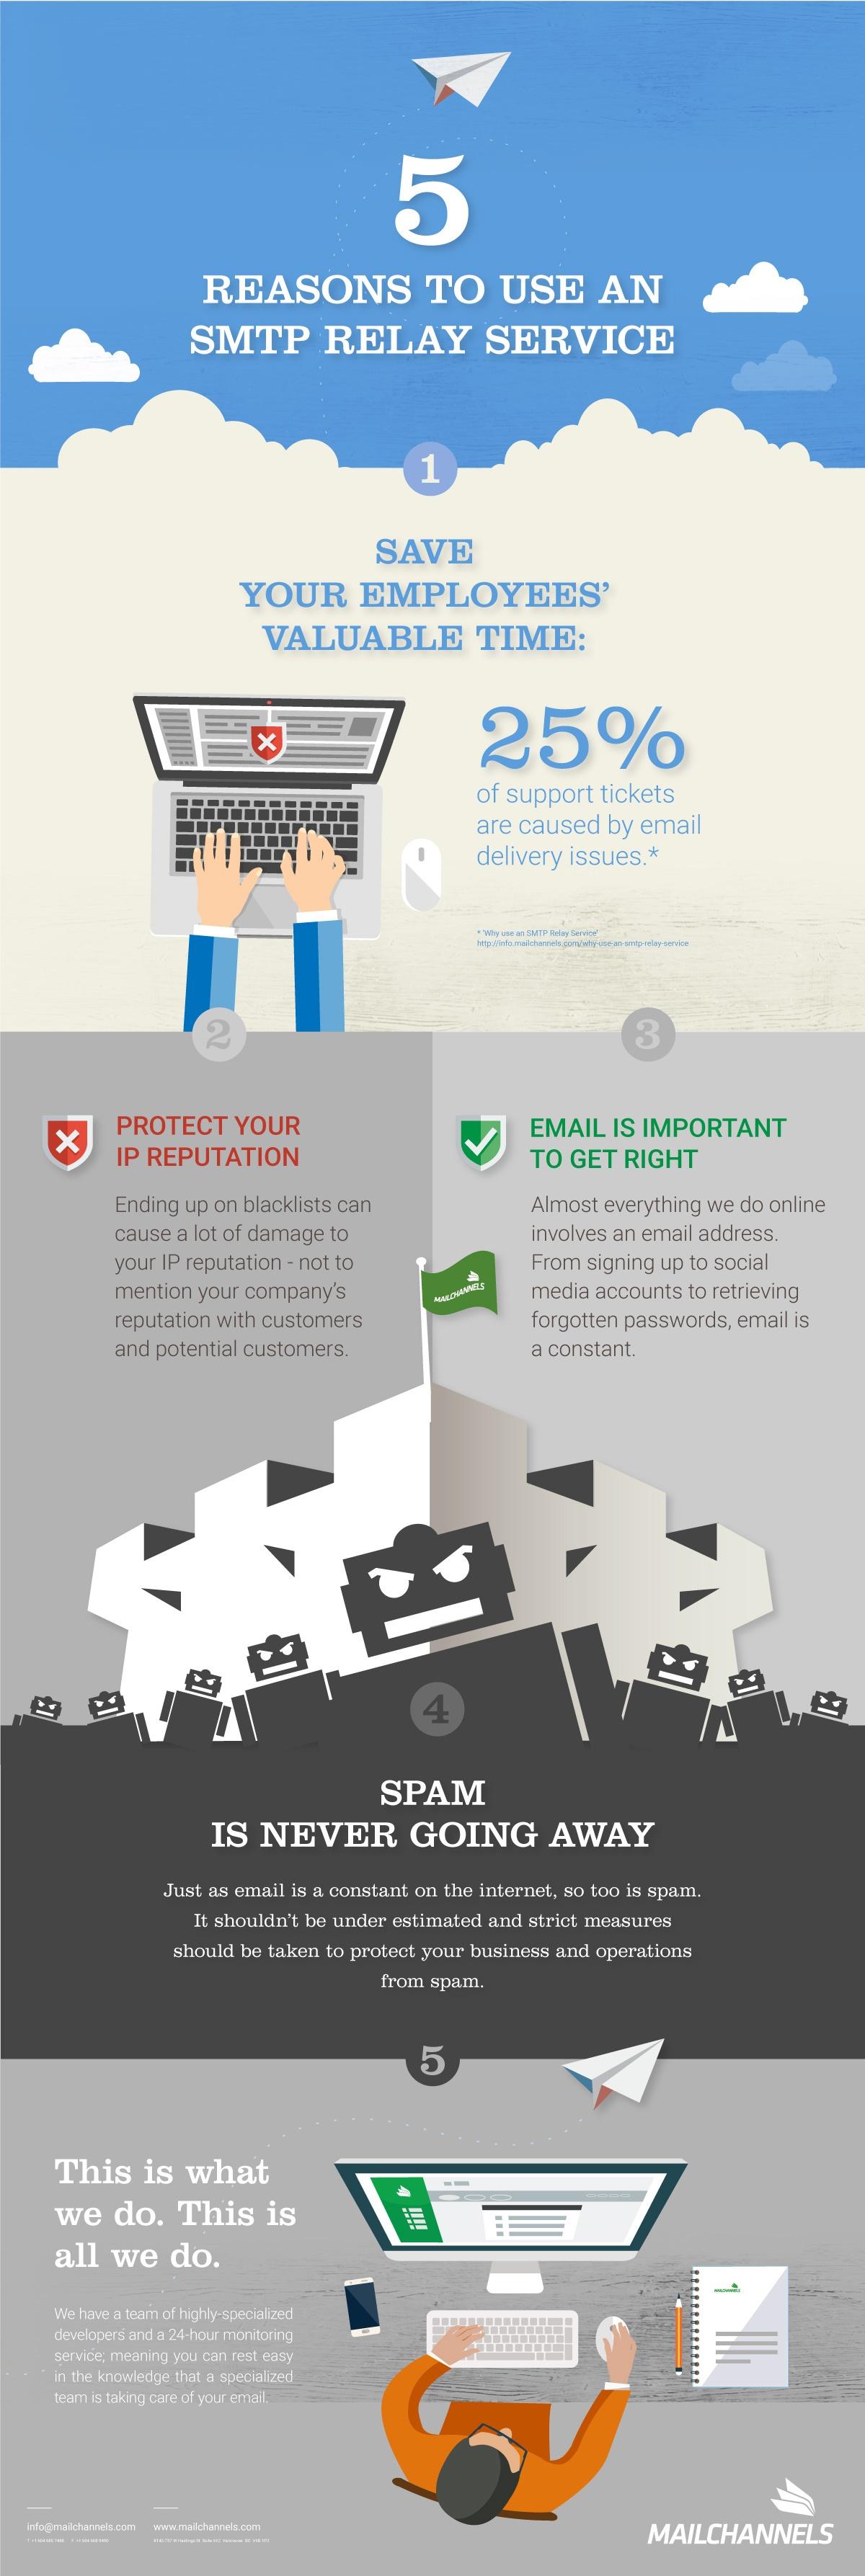 MC_5reasons_infographic_v4 (3).jpg